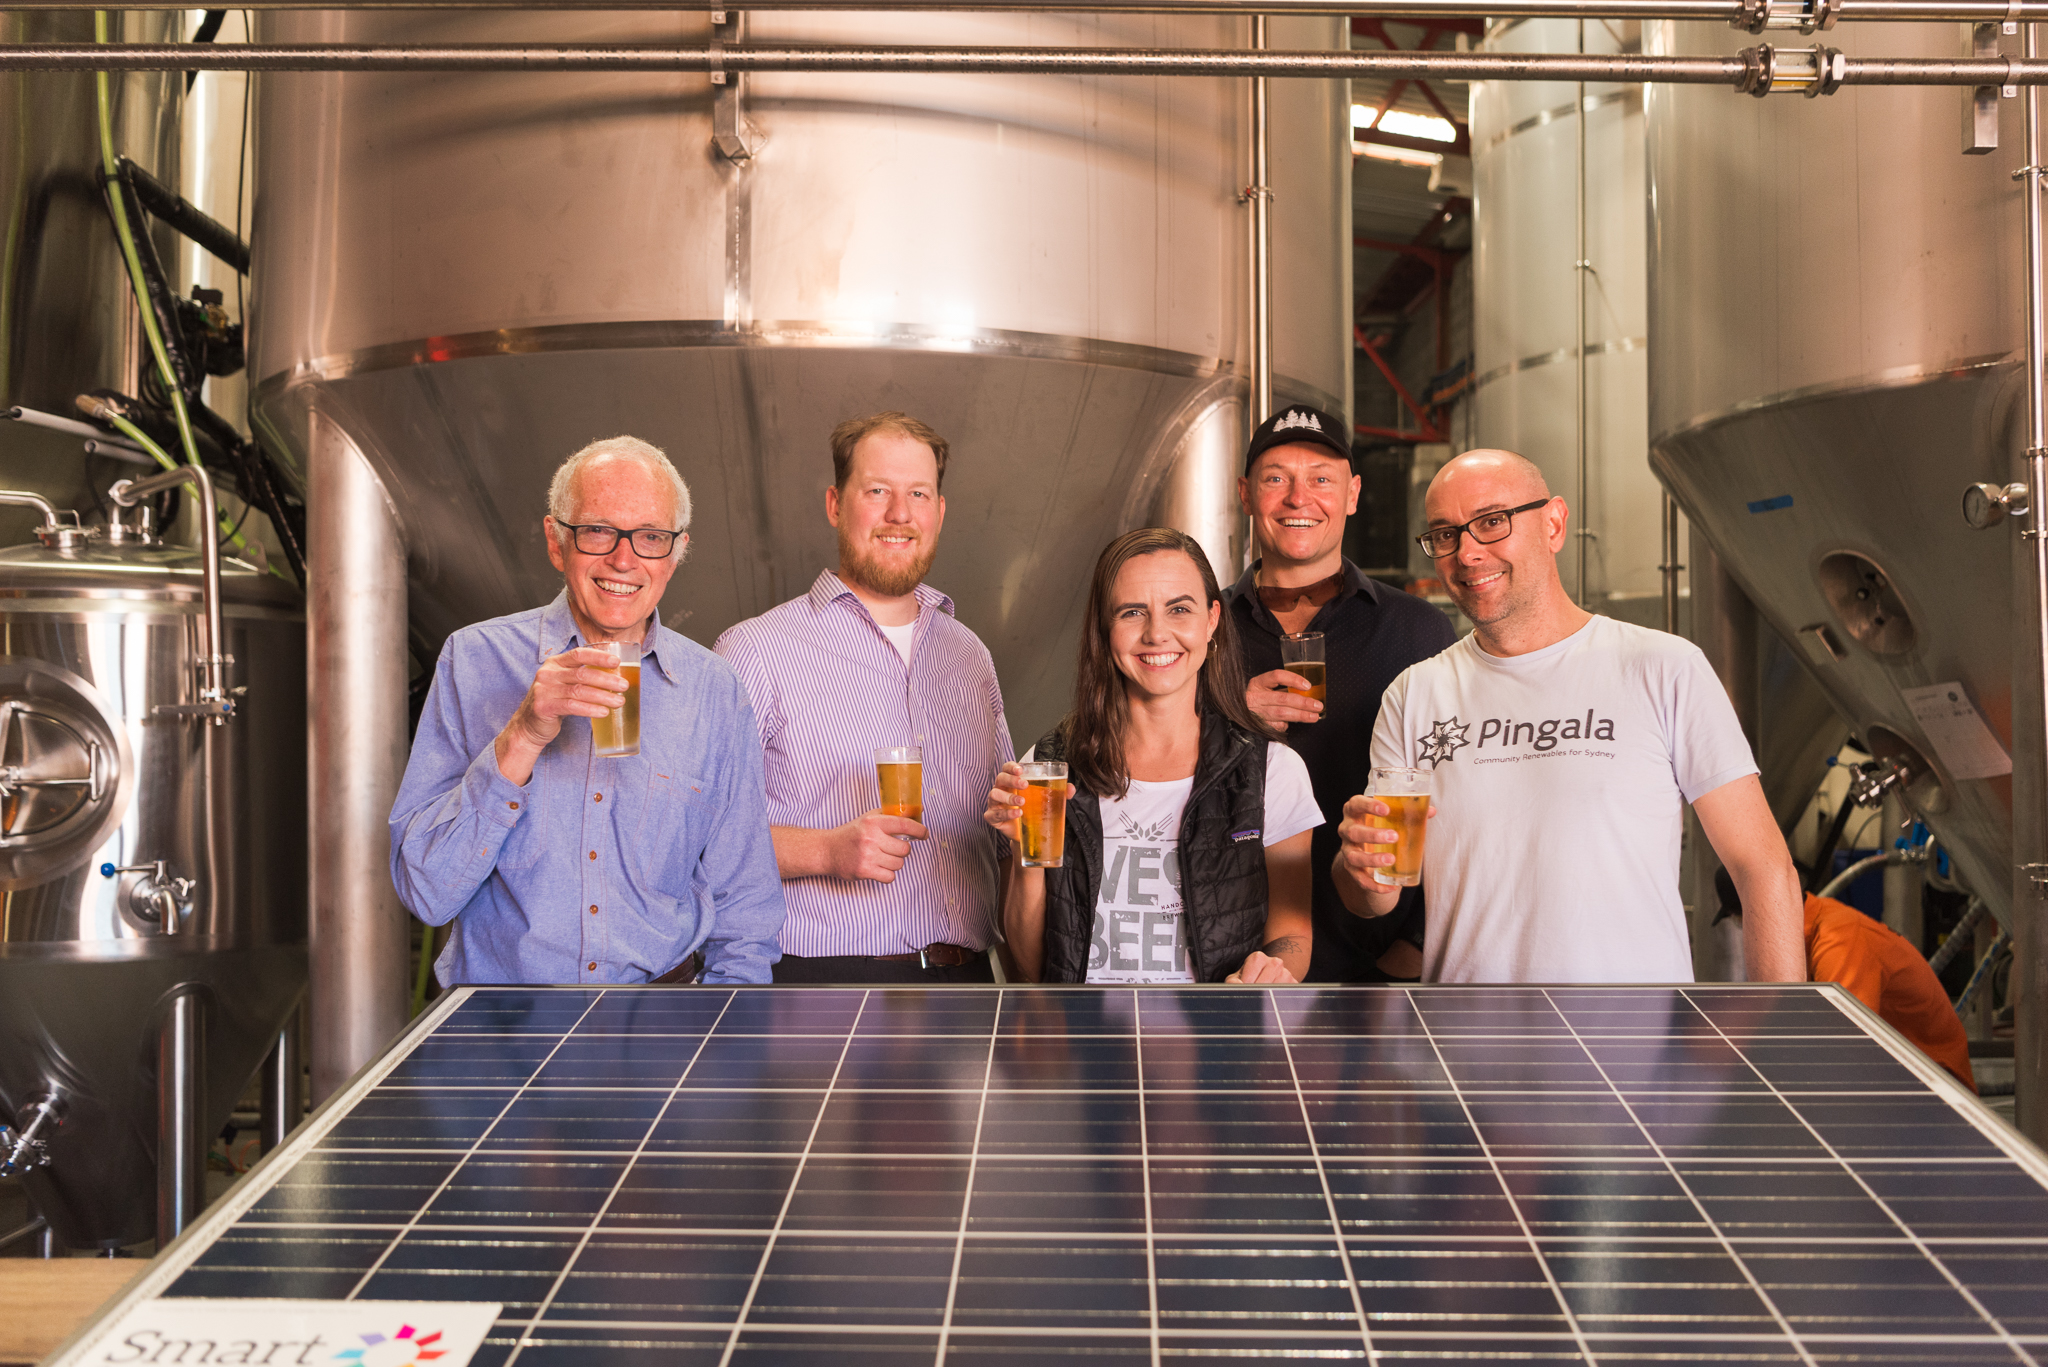 https://www.afr.com/real-estate/sydney-brewery-4-pines-joins-renewable-energy-revolution-20190130-h1an1k